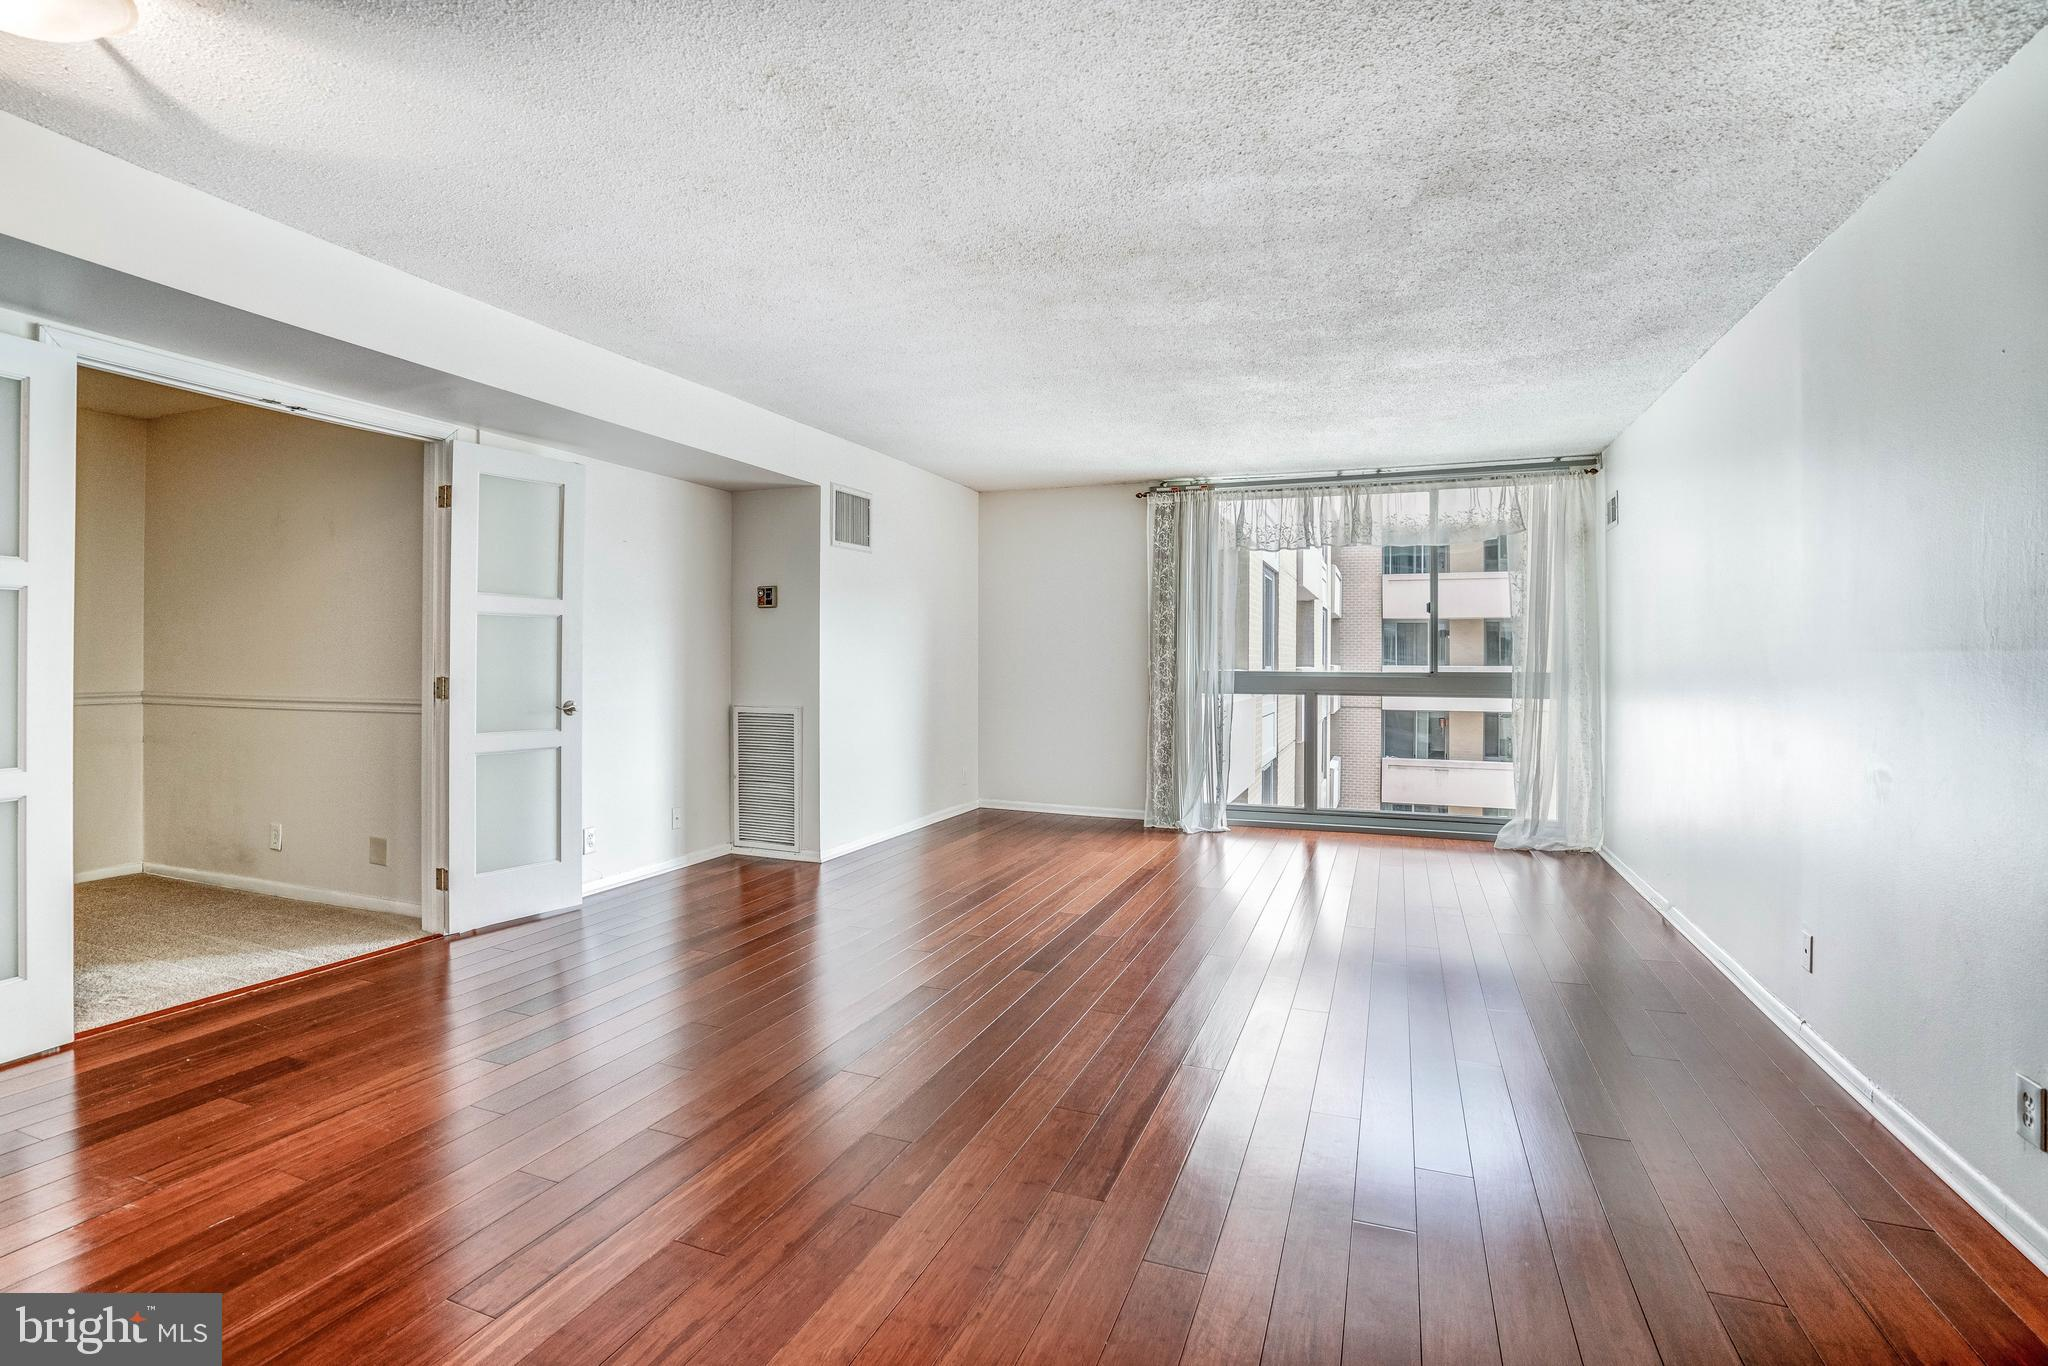 4601 N PARK AVENUE, CHEVY CHASE, Maryland 20815, 1 Bedroom Bedrooms, ,2 BathroomsBathrooms,Condominium,For Sale,4601 N PARK AVENUE,MDMC750162